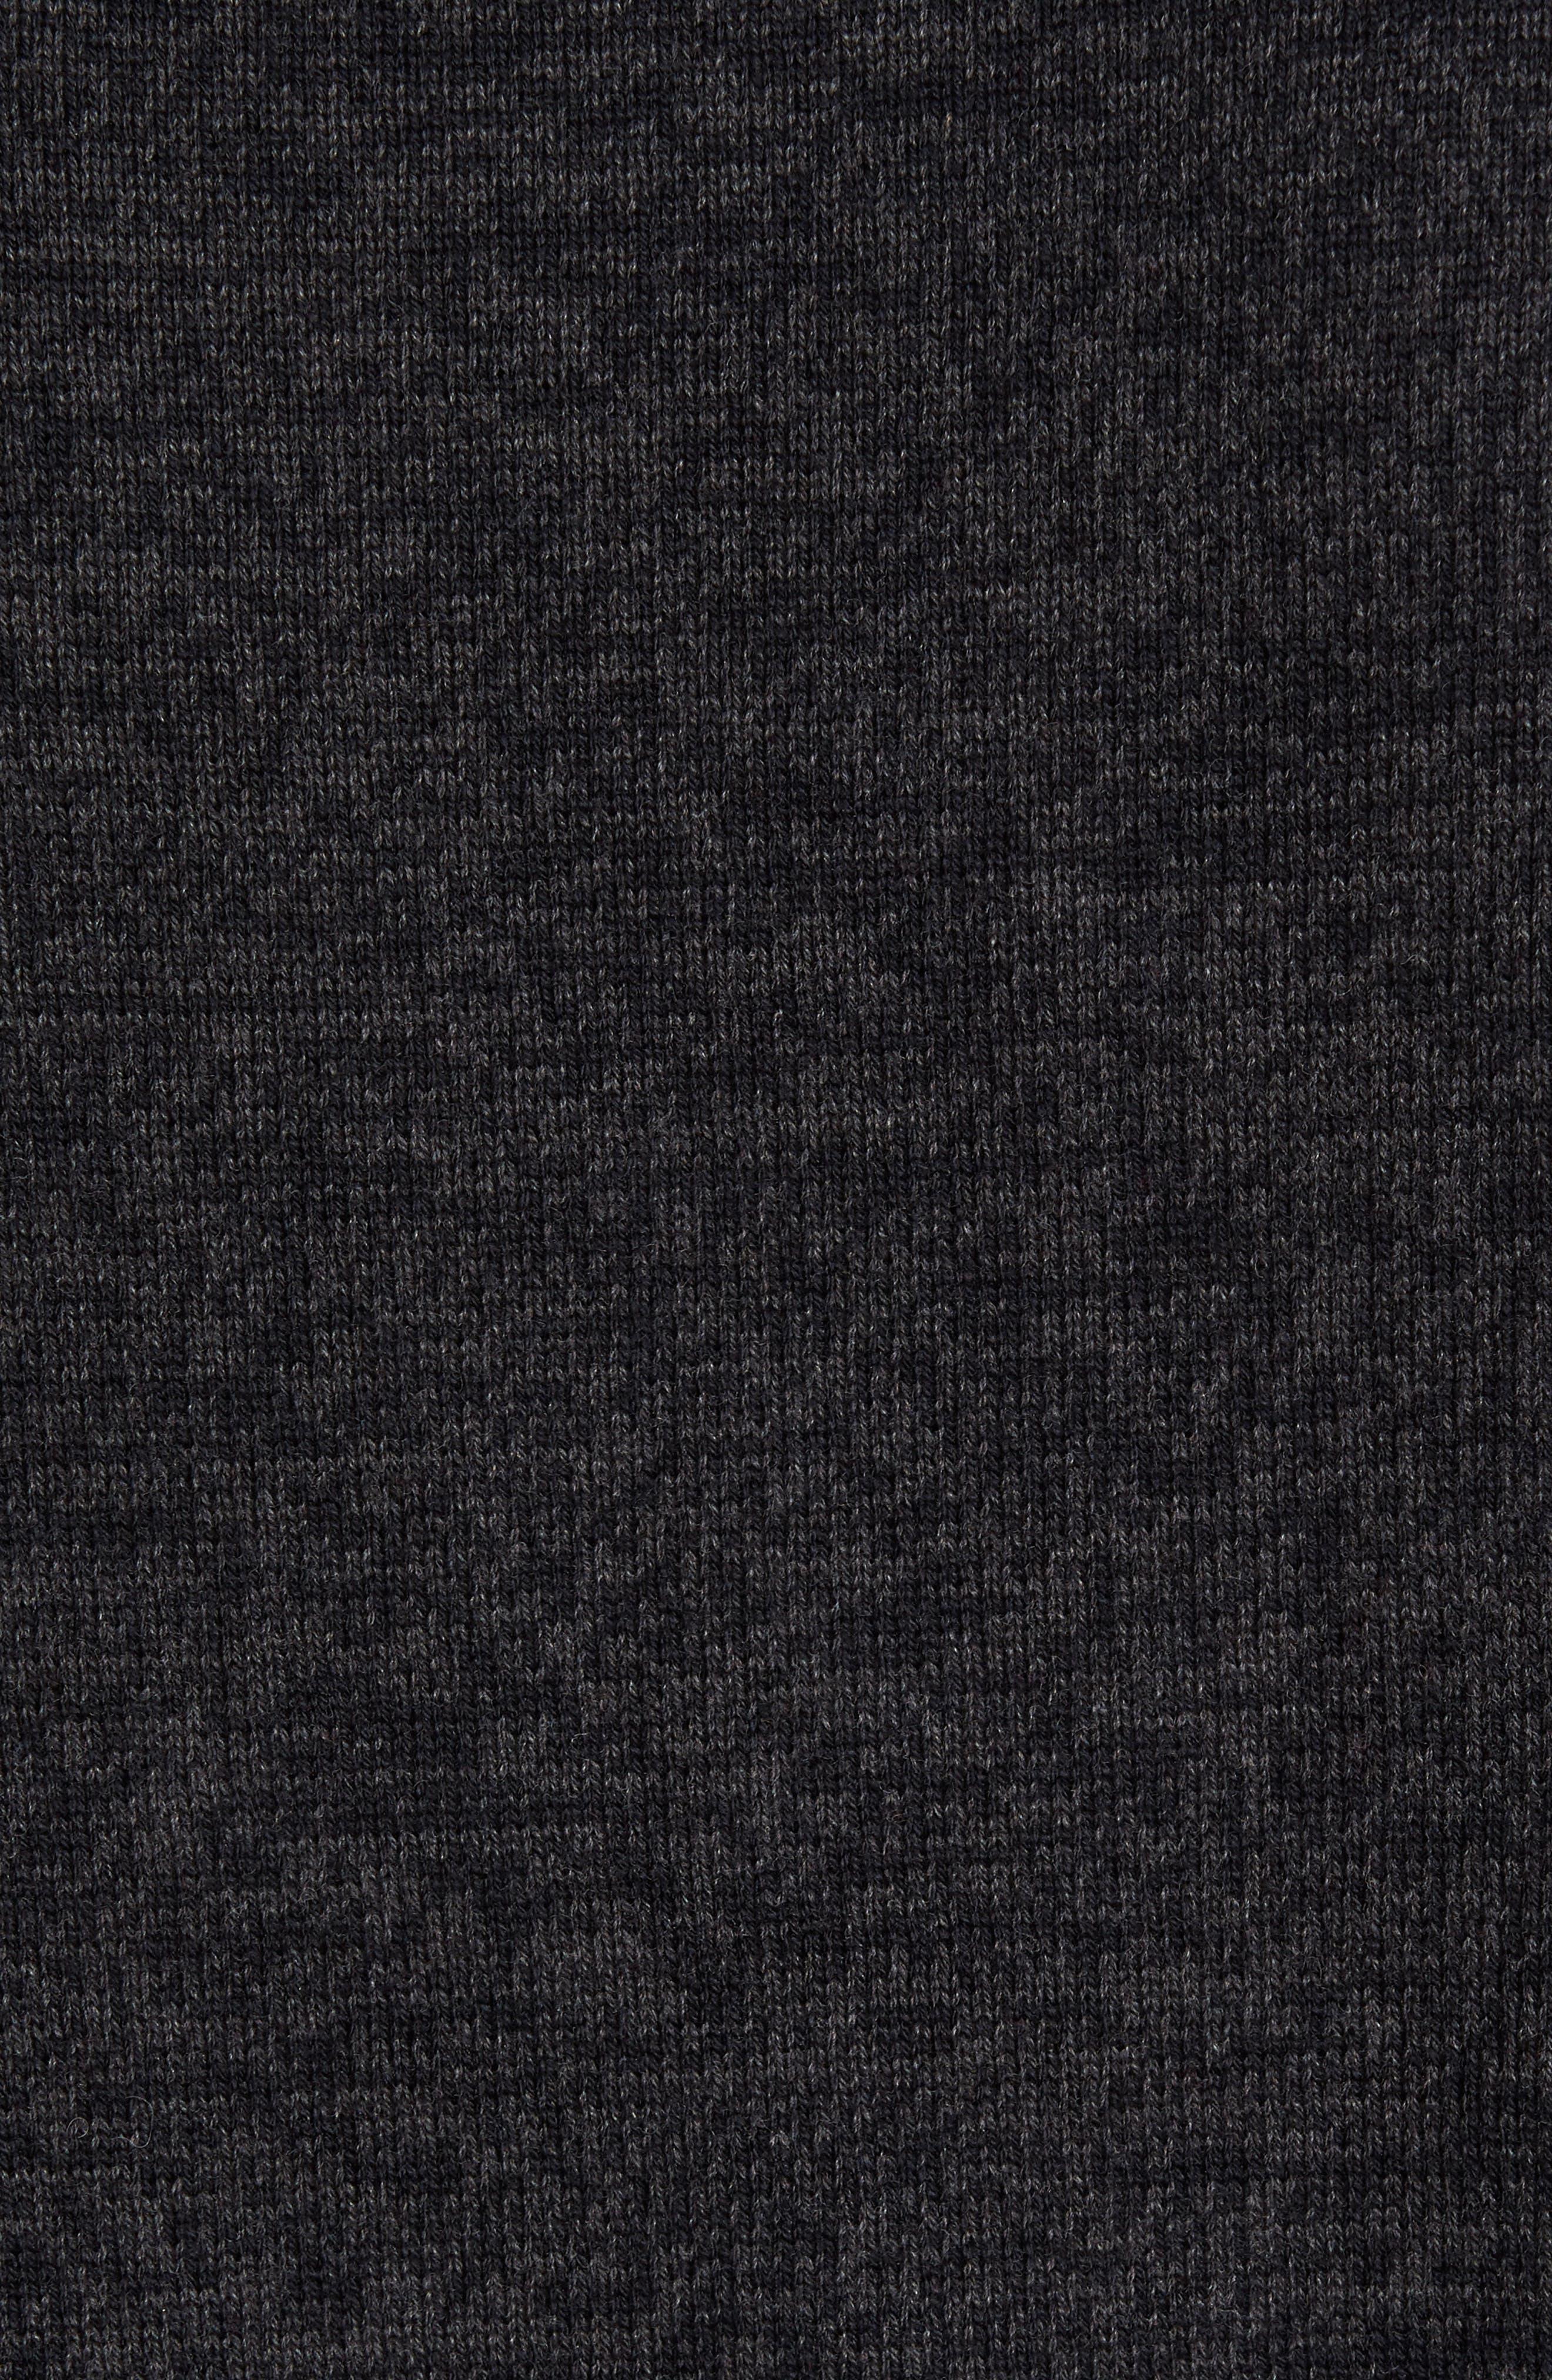 Cotton & Cashmere Roll Neck Sweater,                             Alternate thumbnail 5, color,                             021